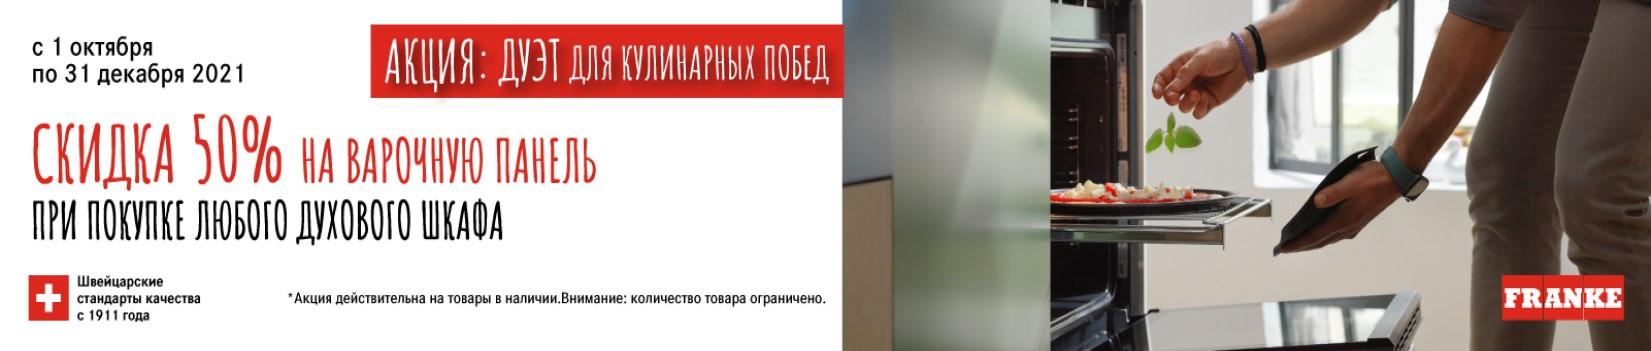 02.10.2021_1650x350varka